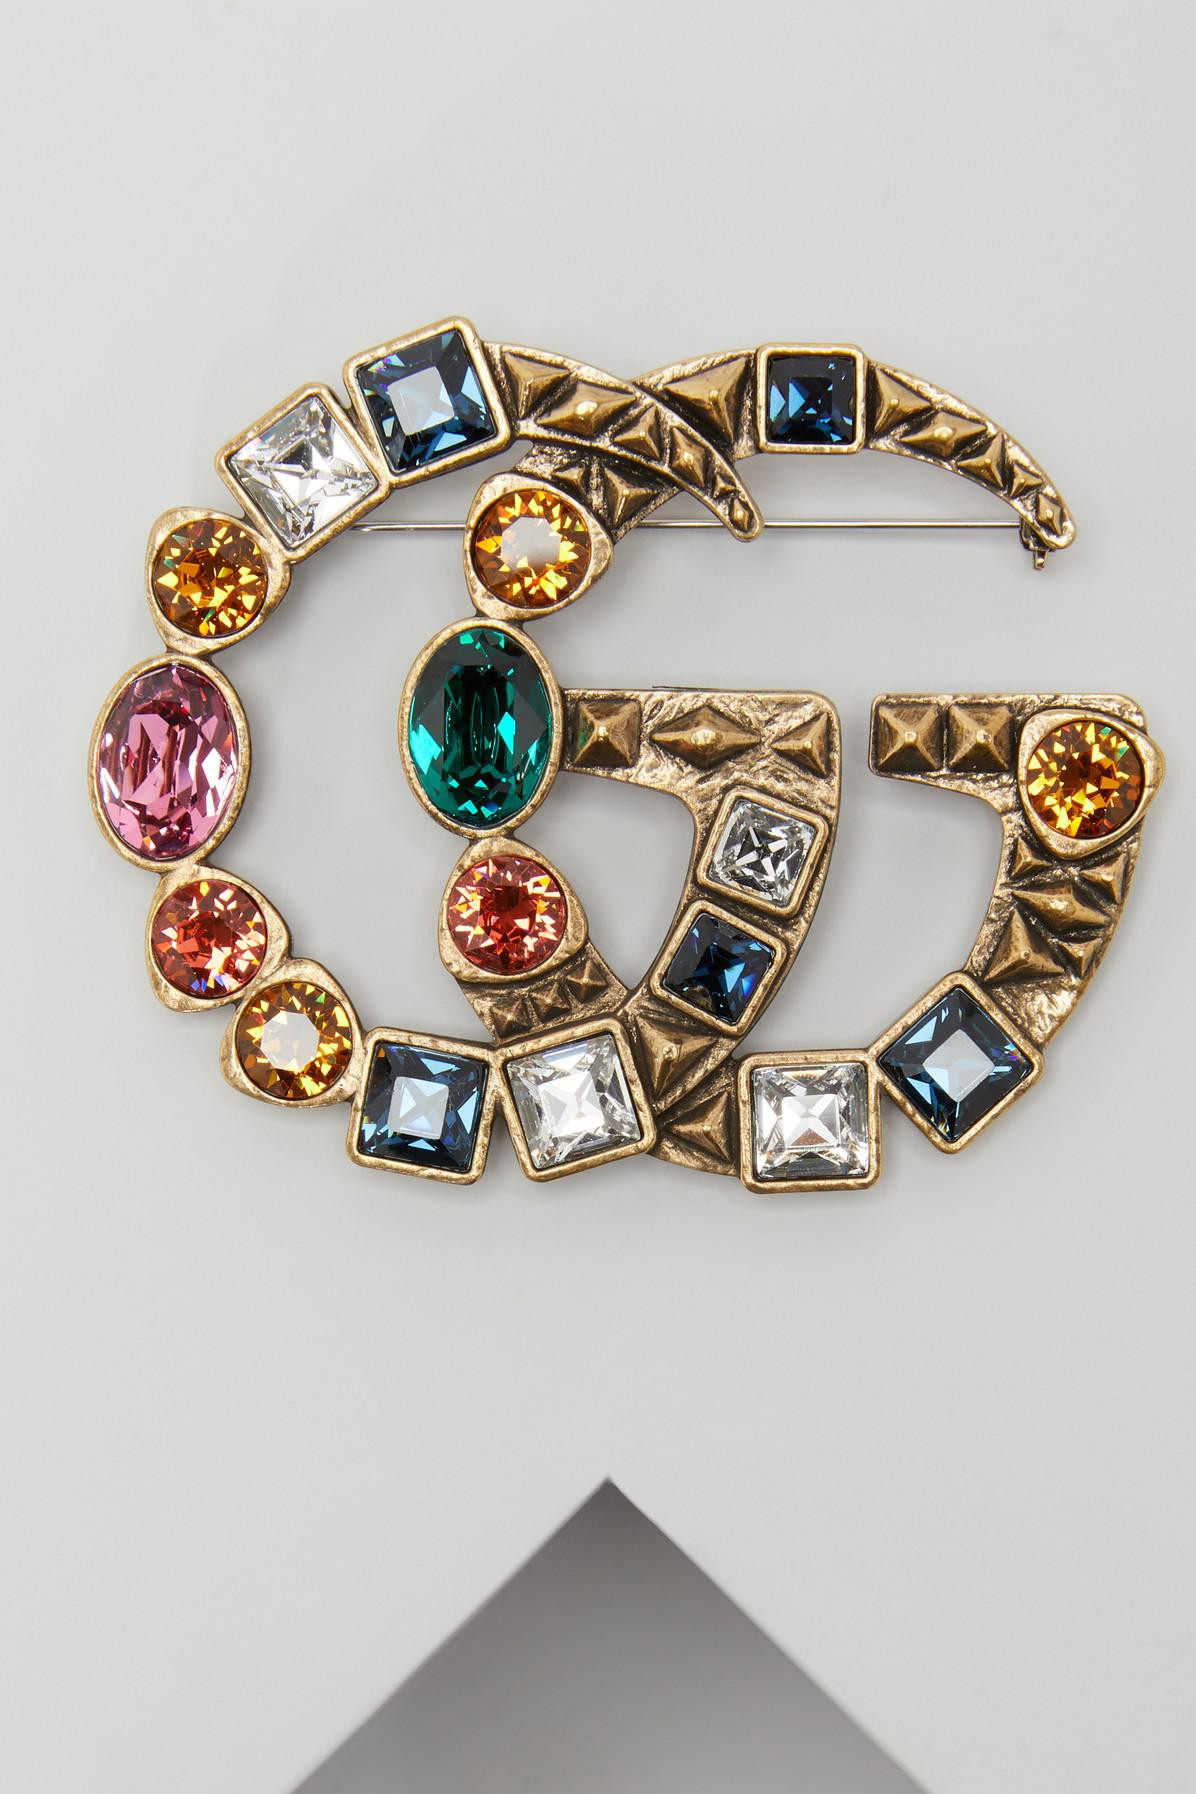 Gucci Brooches  Gucci GG Crystal Brooch in Metallic Lyst